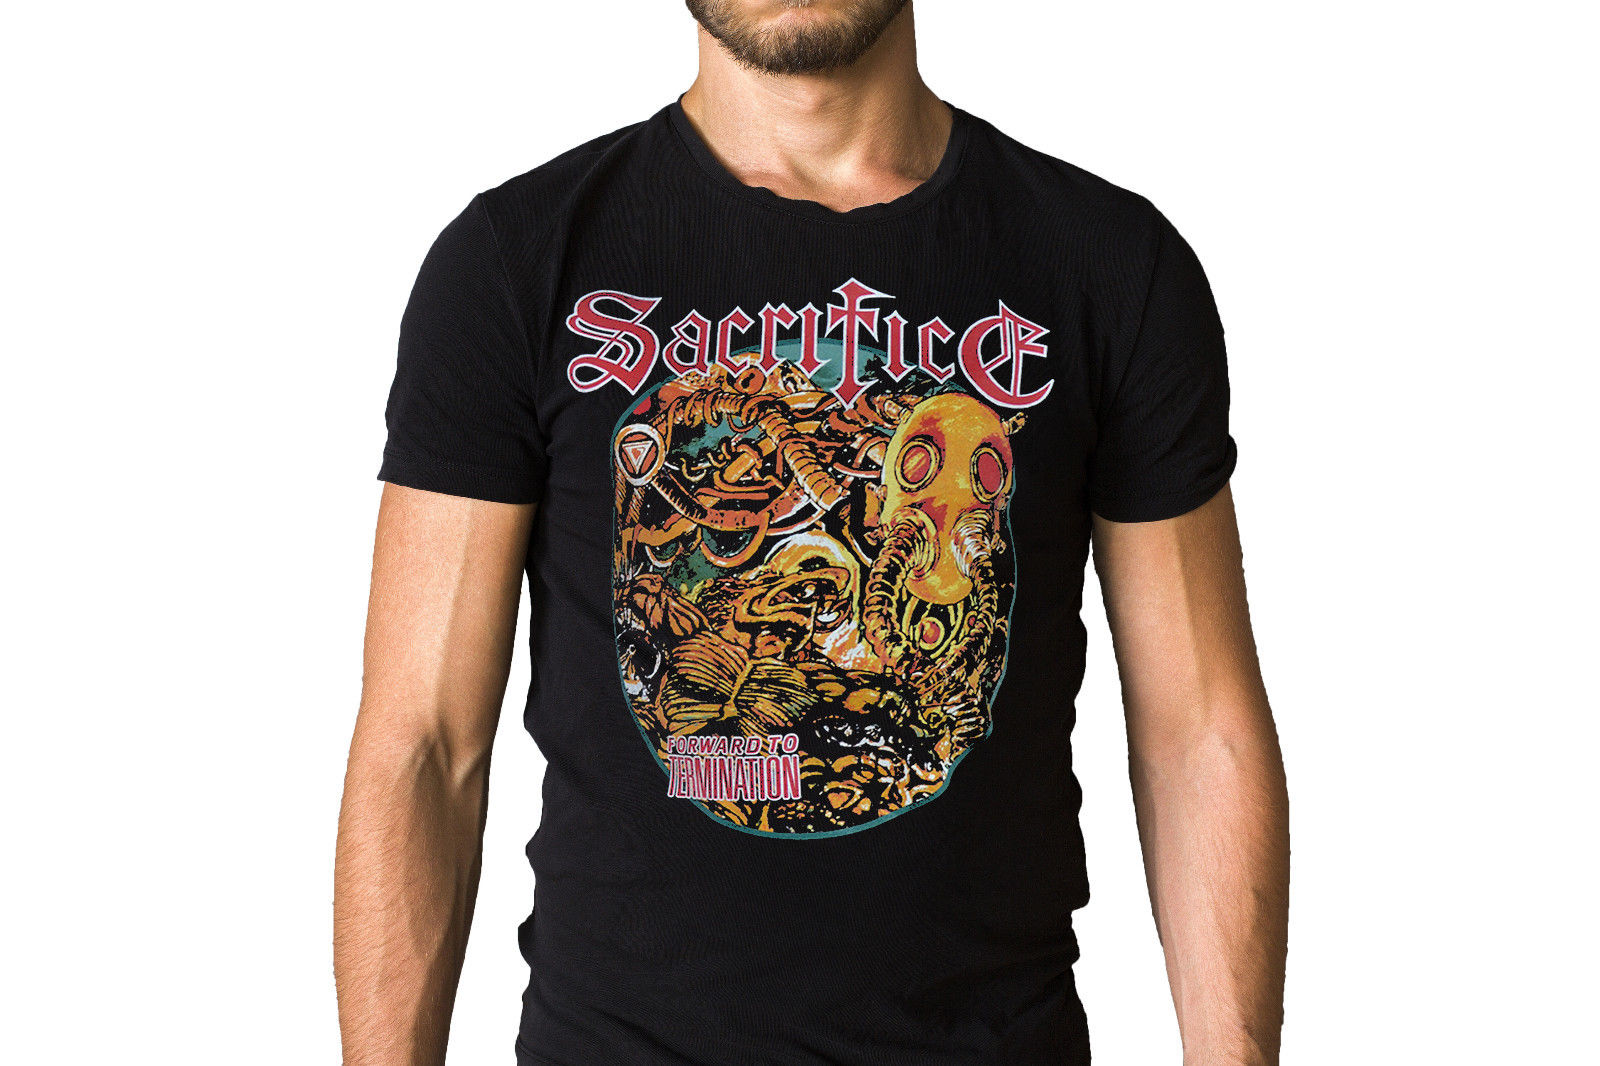 Sacrifice Forward To Termination 1987 Zipper Sweatshirt T Shirt Discount 100 % Cotton T Shirt For Men'S Anime